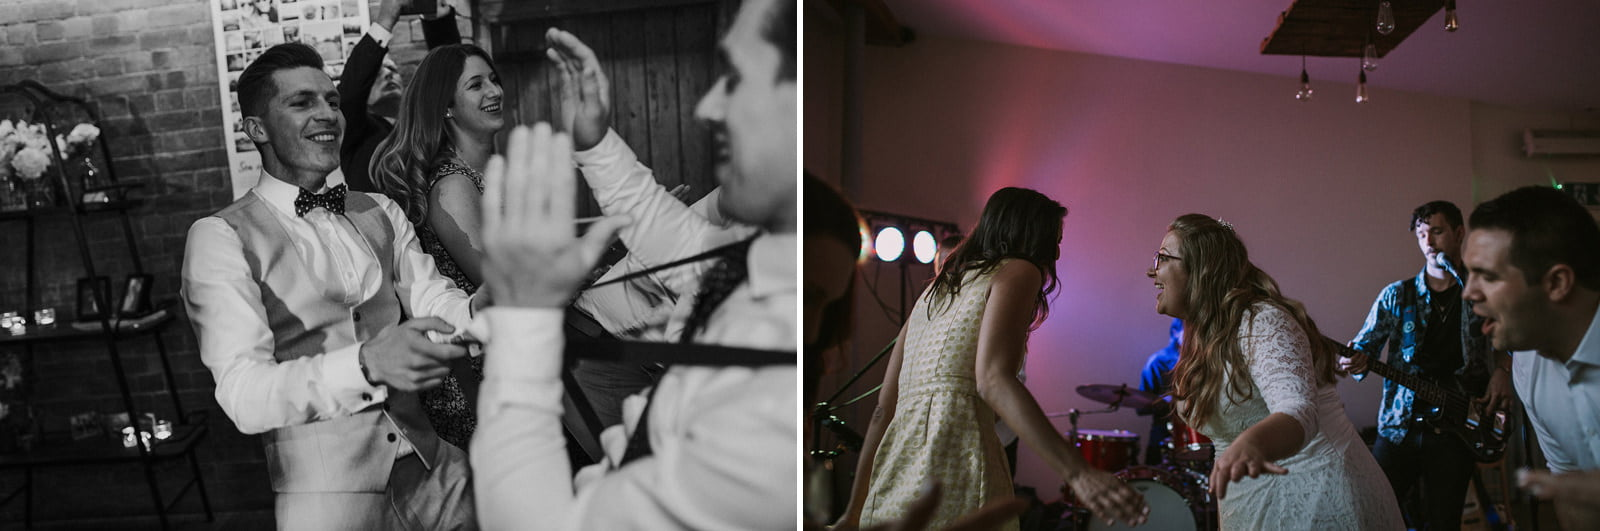 fun wedding photos warwickshire